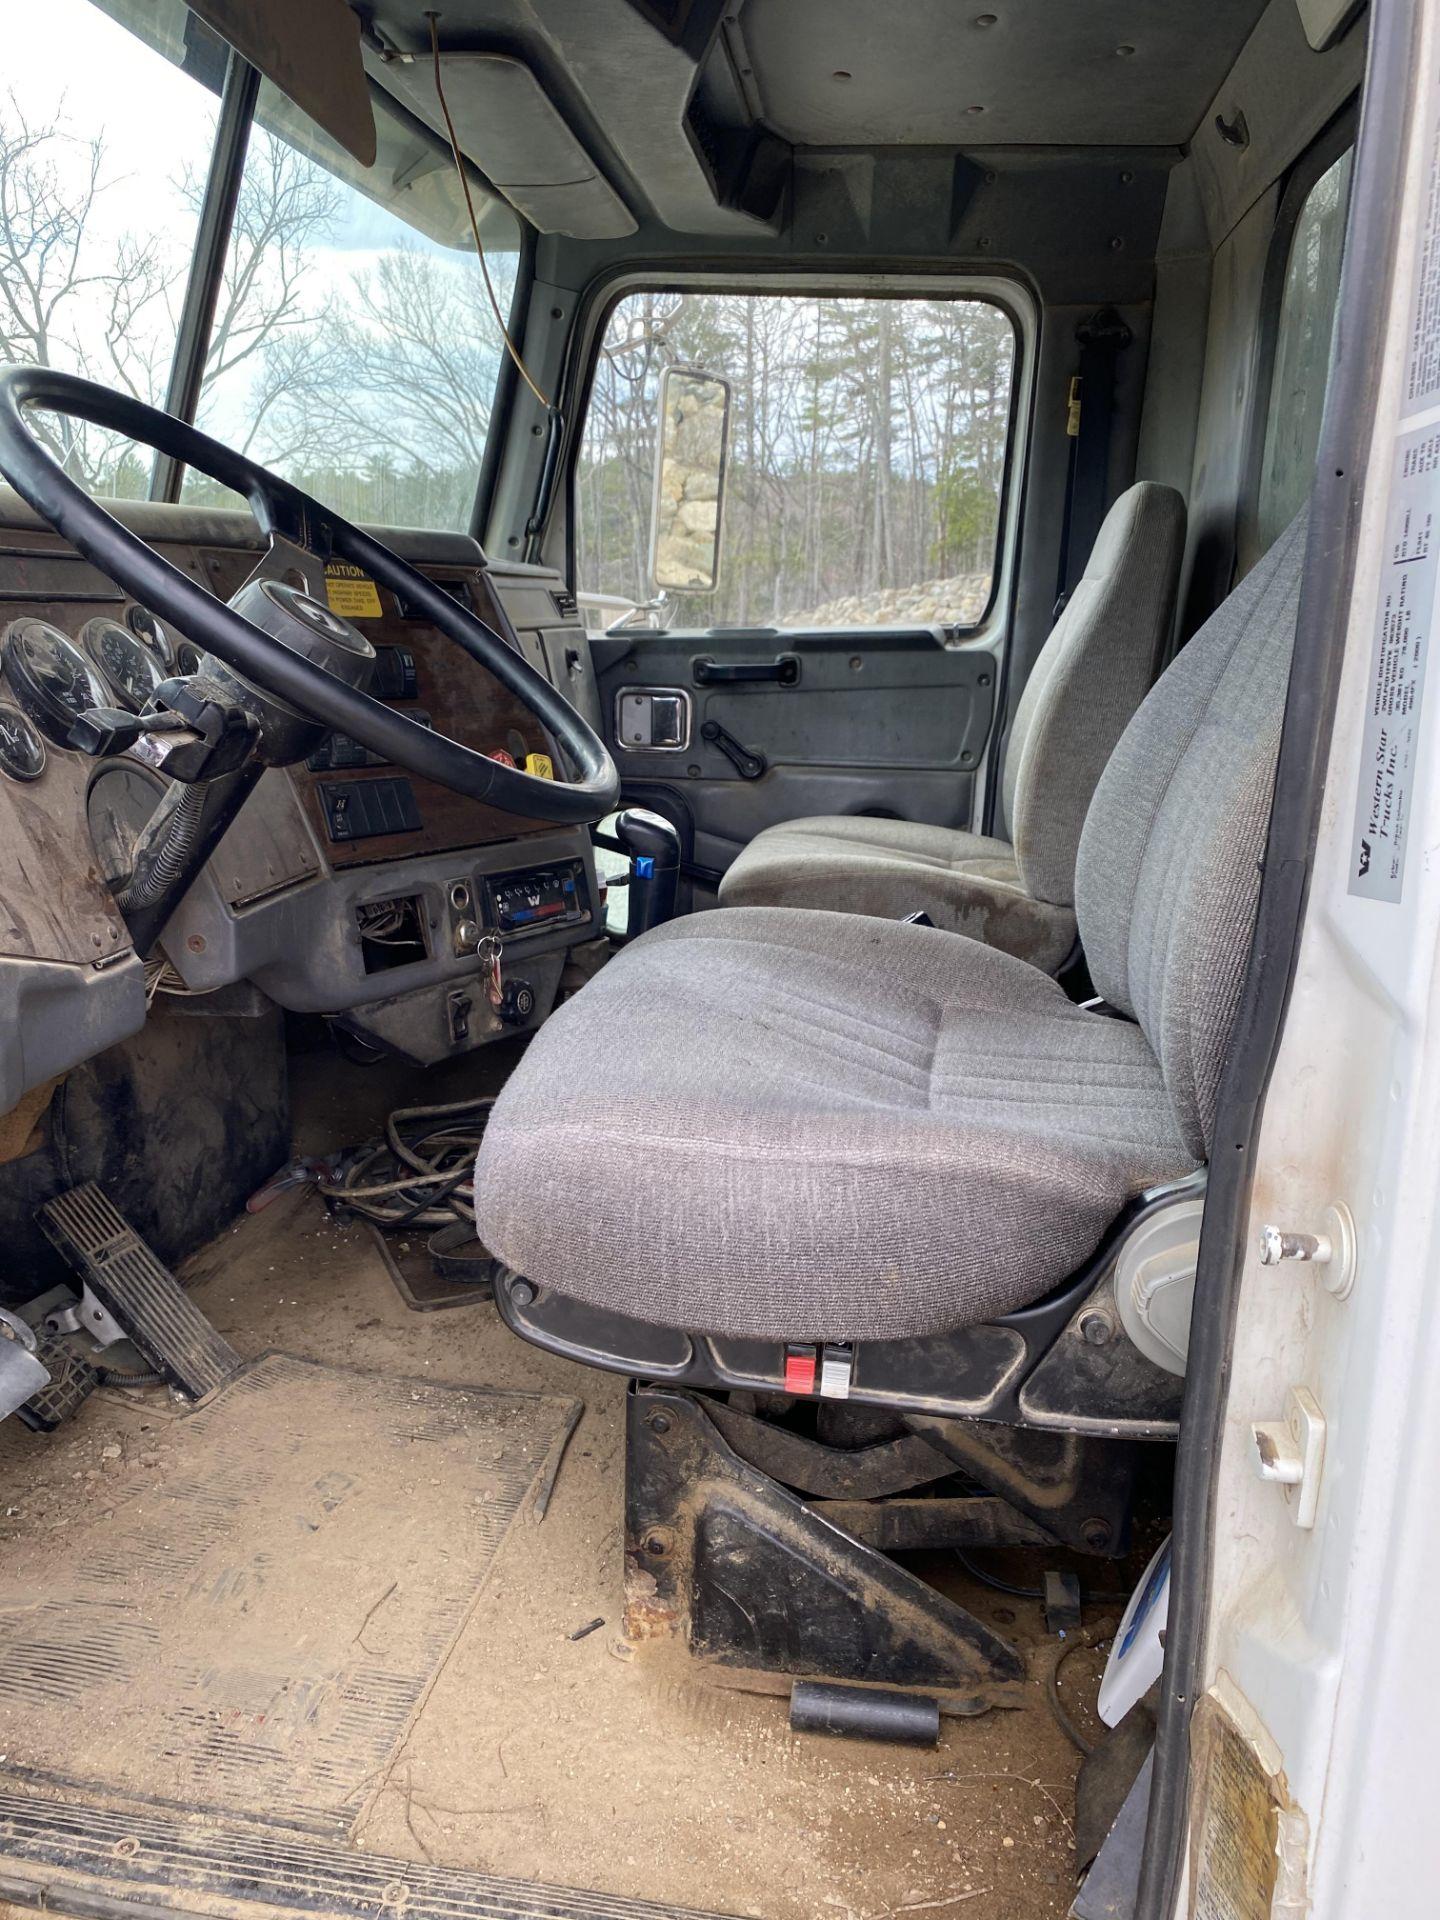 2000 Western Star 12 Wheel Dump w/ Drop Axle, Cat Diesel C10 6 CYL. 78,000 GVWR, ODOM 323,142, - Image 7 of 8